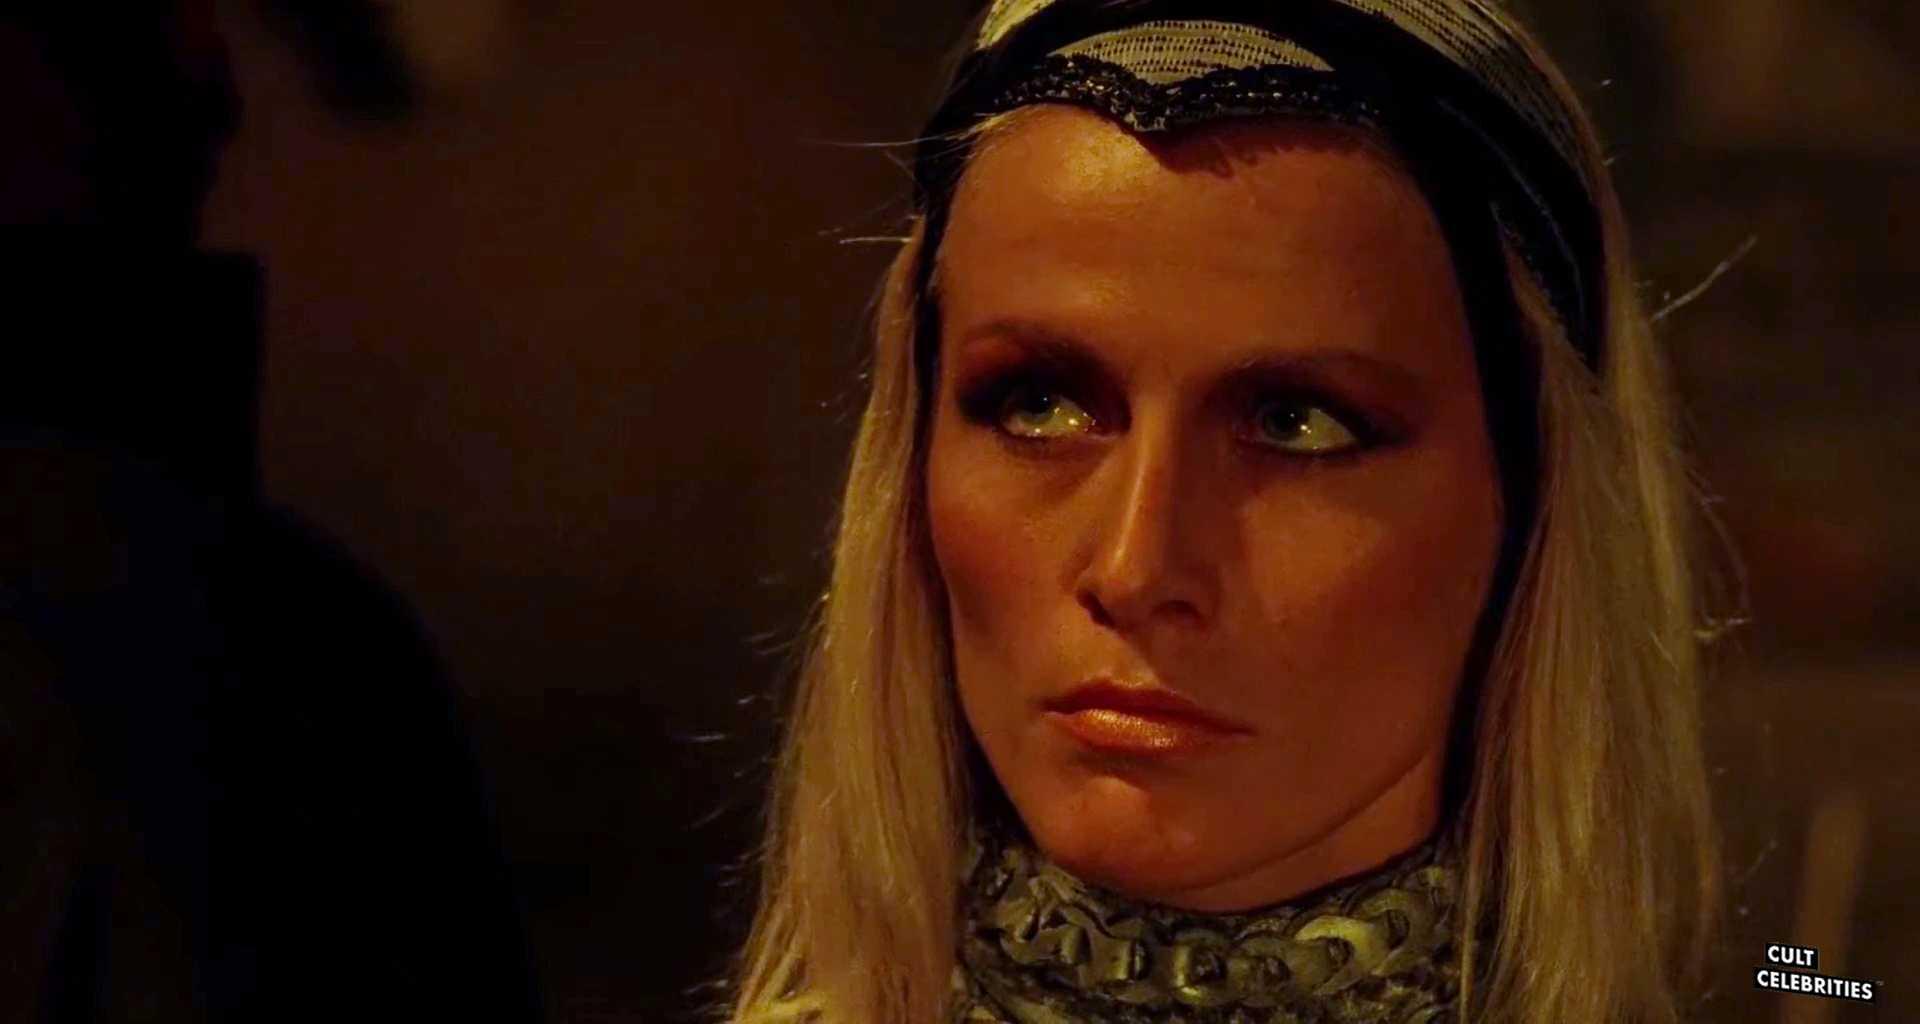 Danitza Kingsley in Amazons (1986)